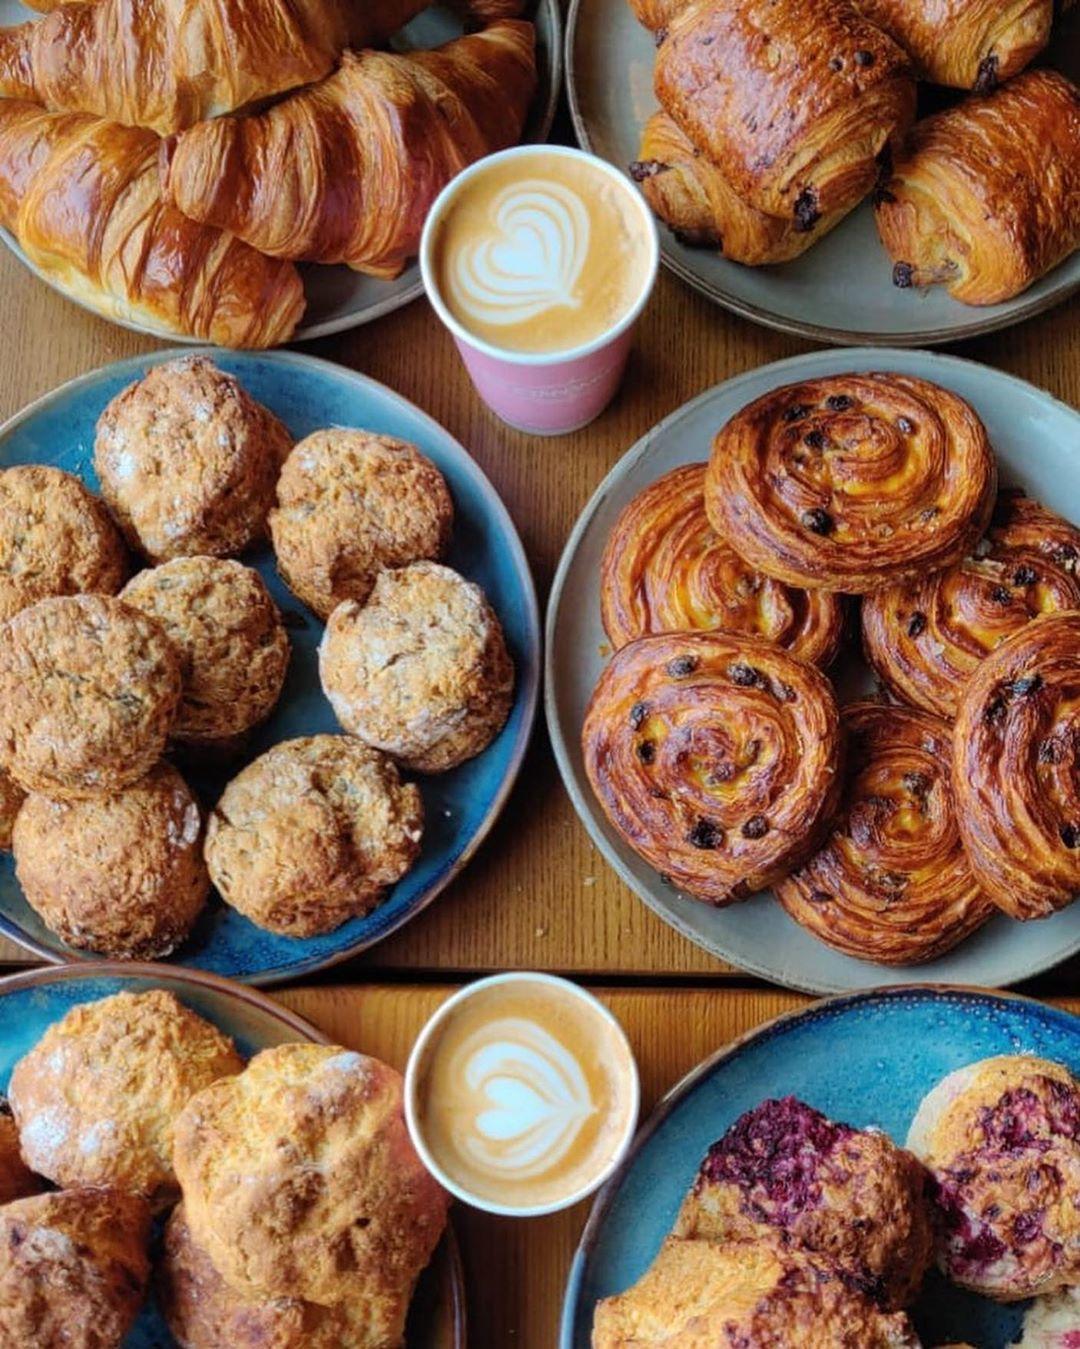 DLR Tourism eateries: Cinnamon cafe, Monkstown